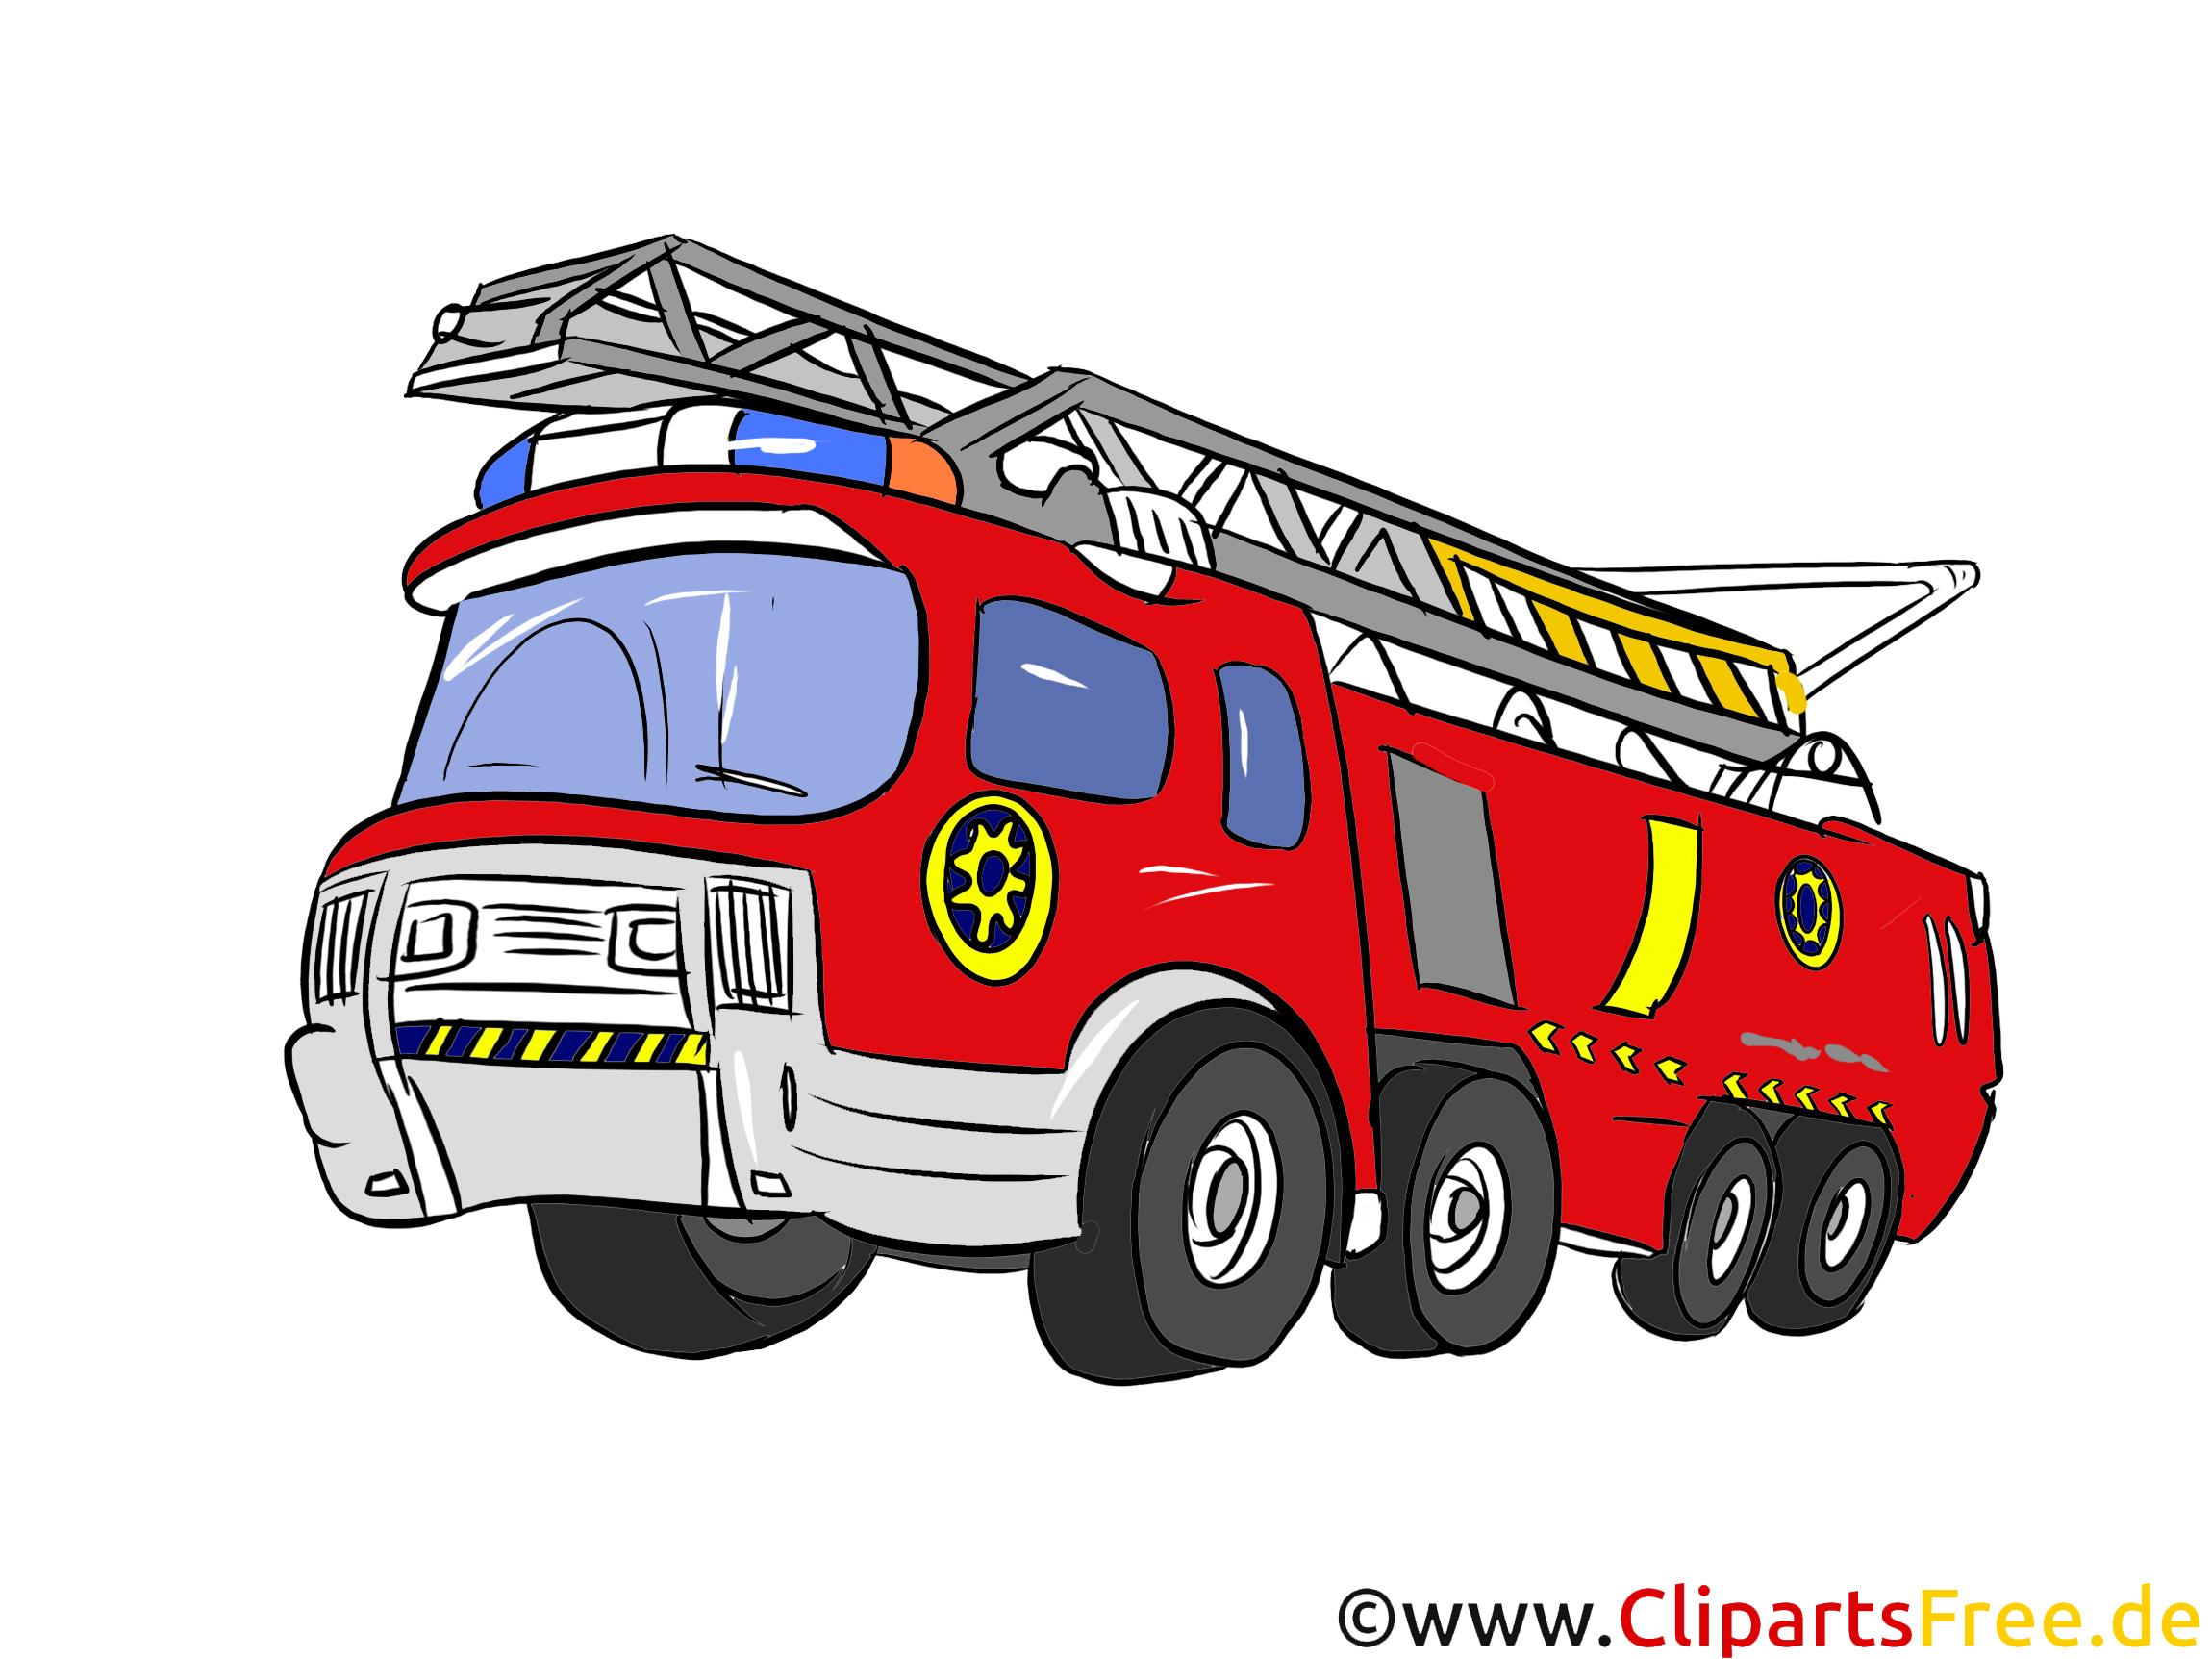 Feuerwehrauto Illustration, Bild, Clipart Autos